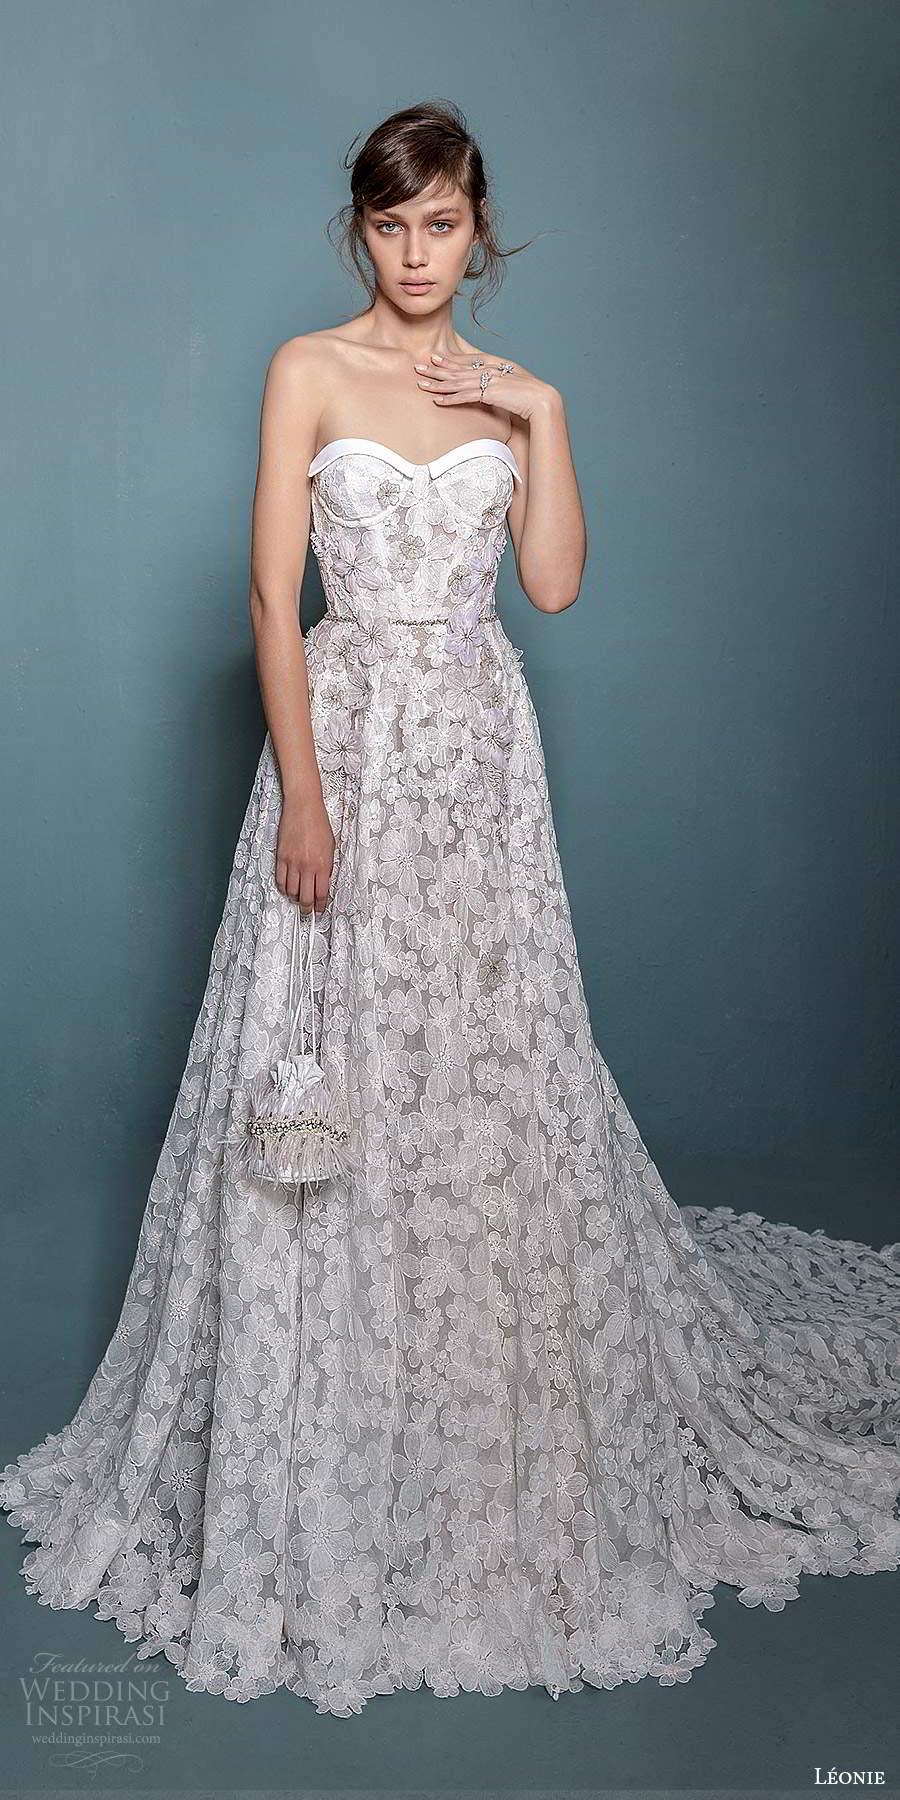 leonie bridal 2020 bridal strapless semi sweetheart neckline fully embellished a line ball gown wedding dress chapel train (2) mv